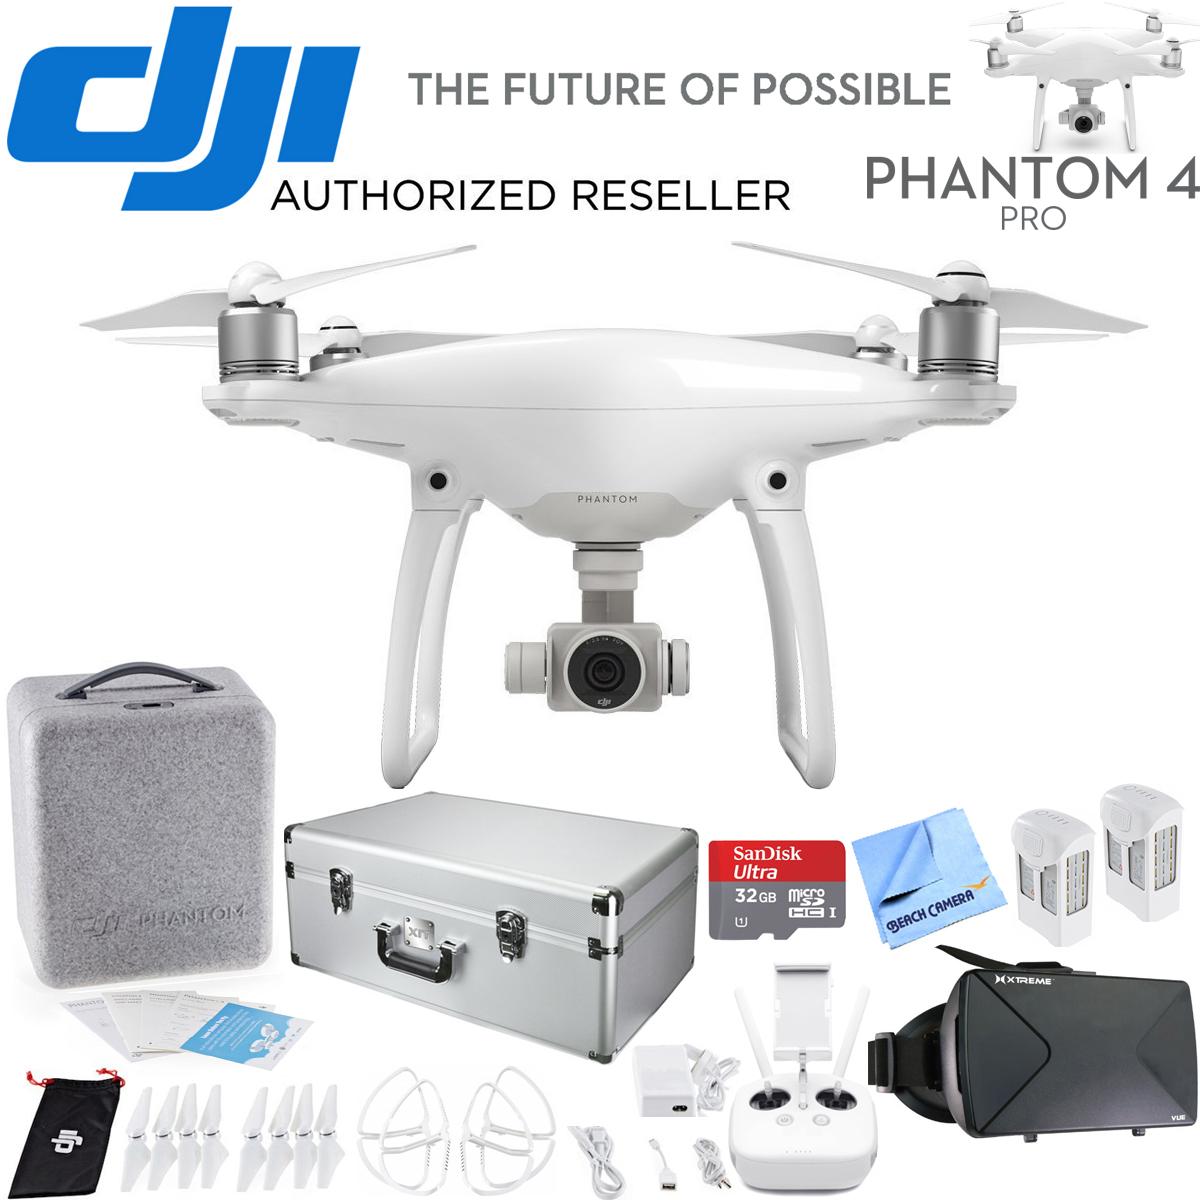 Phantom Electric Supercharger Amazon: DJI Phantom 4 Pro Quadcopter Drone